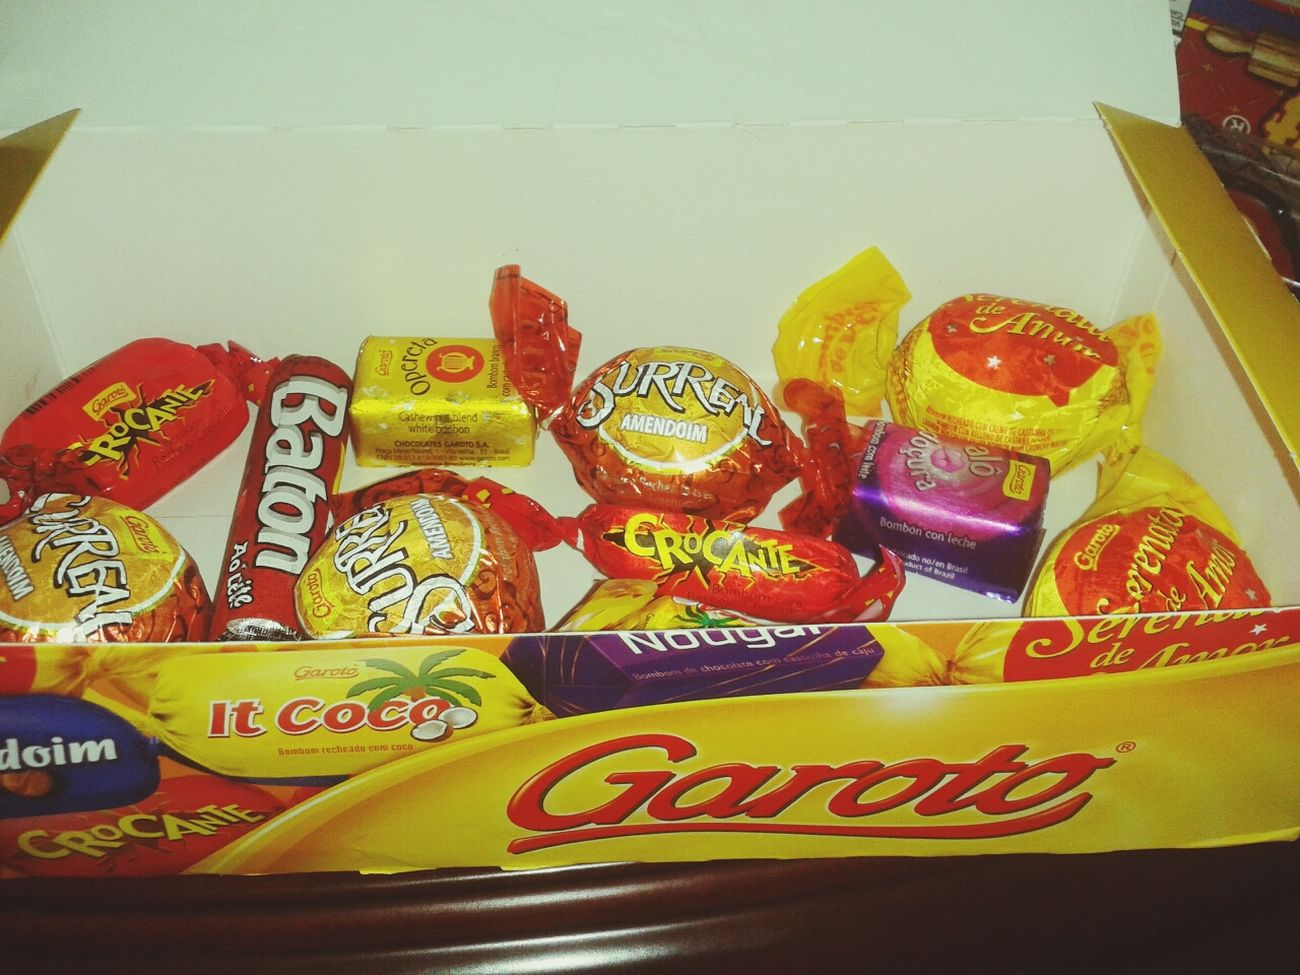 feeling brazillian gessh, say Hi to Garoto Special Brazilian Sweets :D